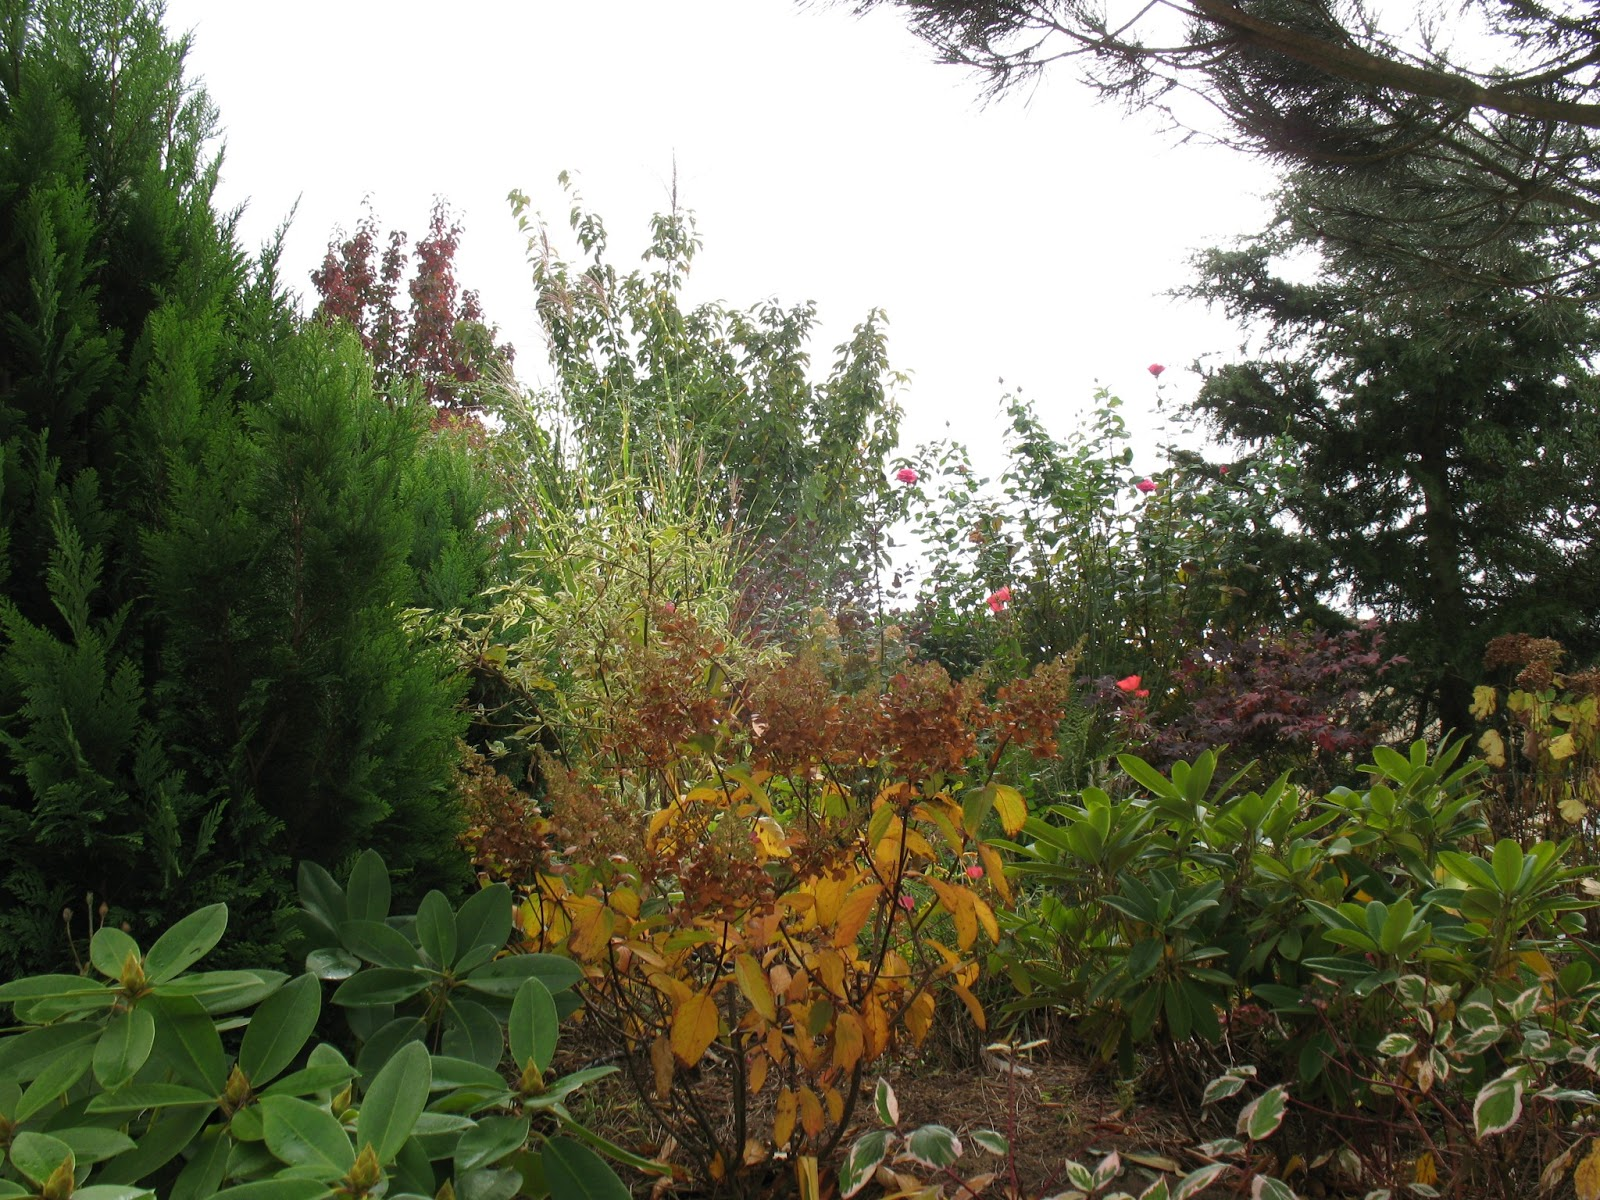 Roses du jardin ch neland le jardin en octobre for Jardin octobre